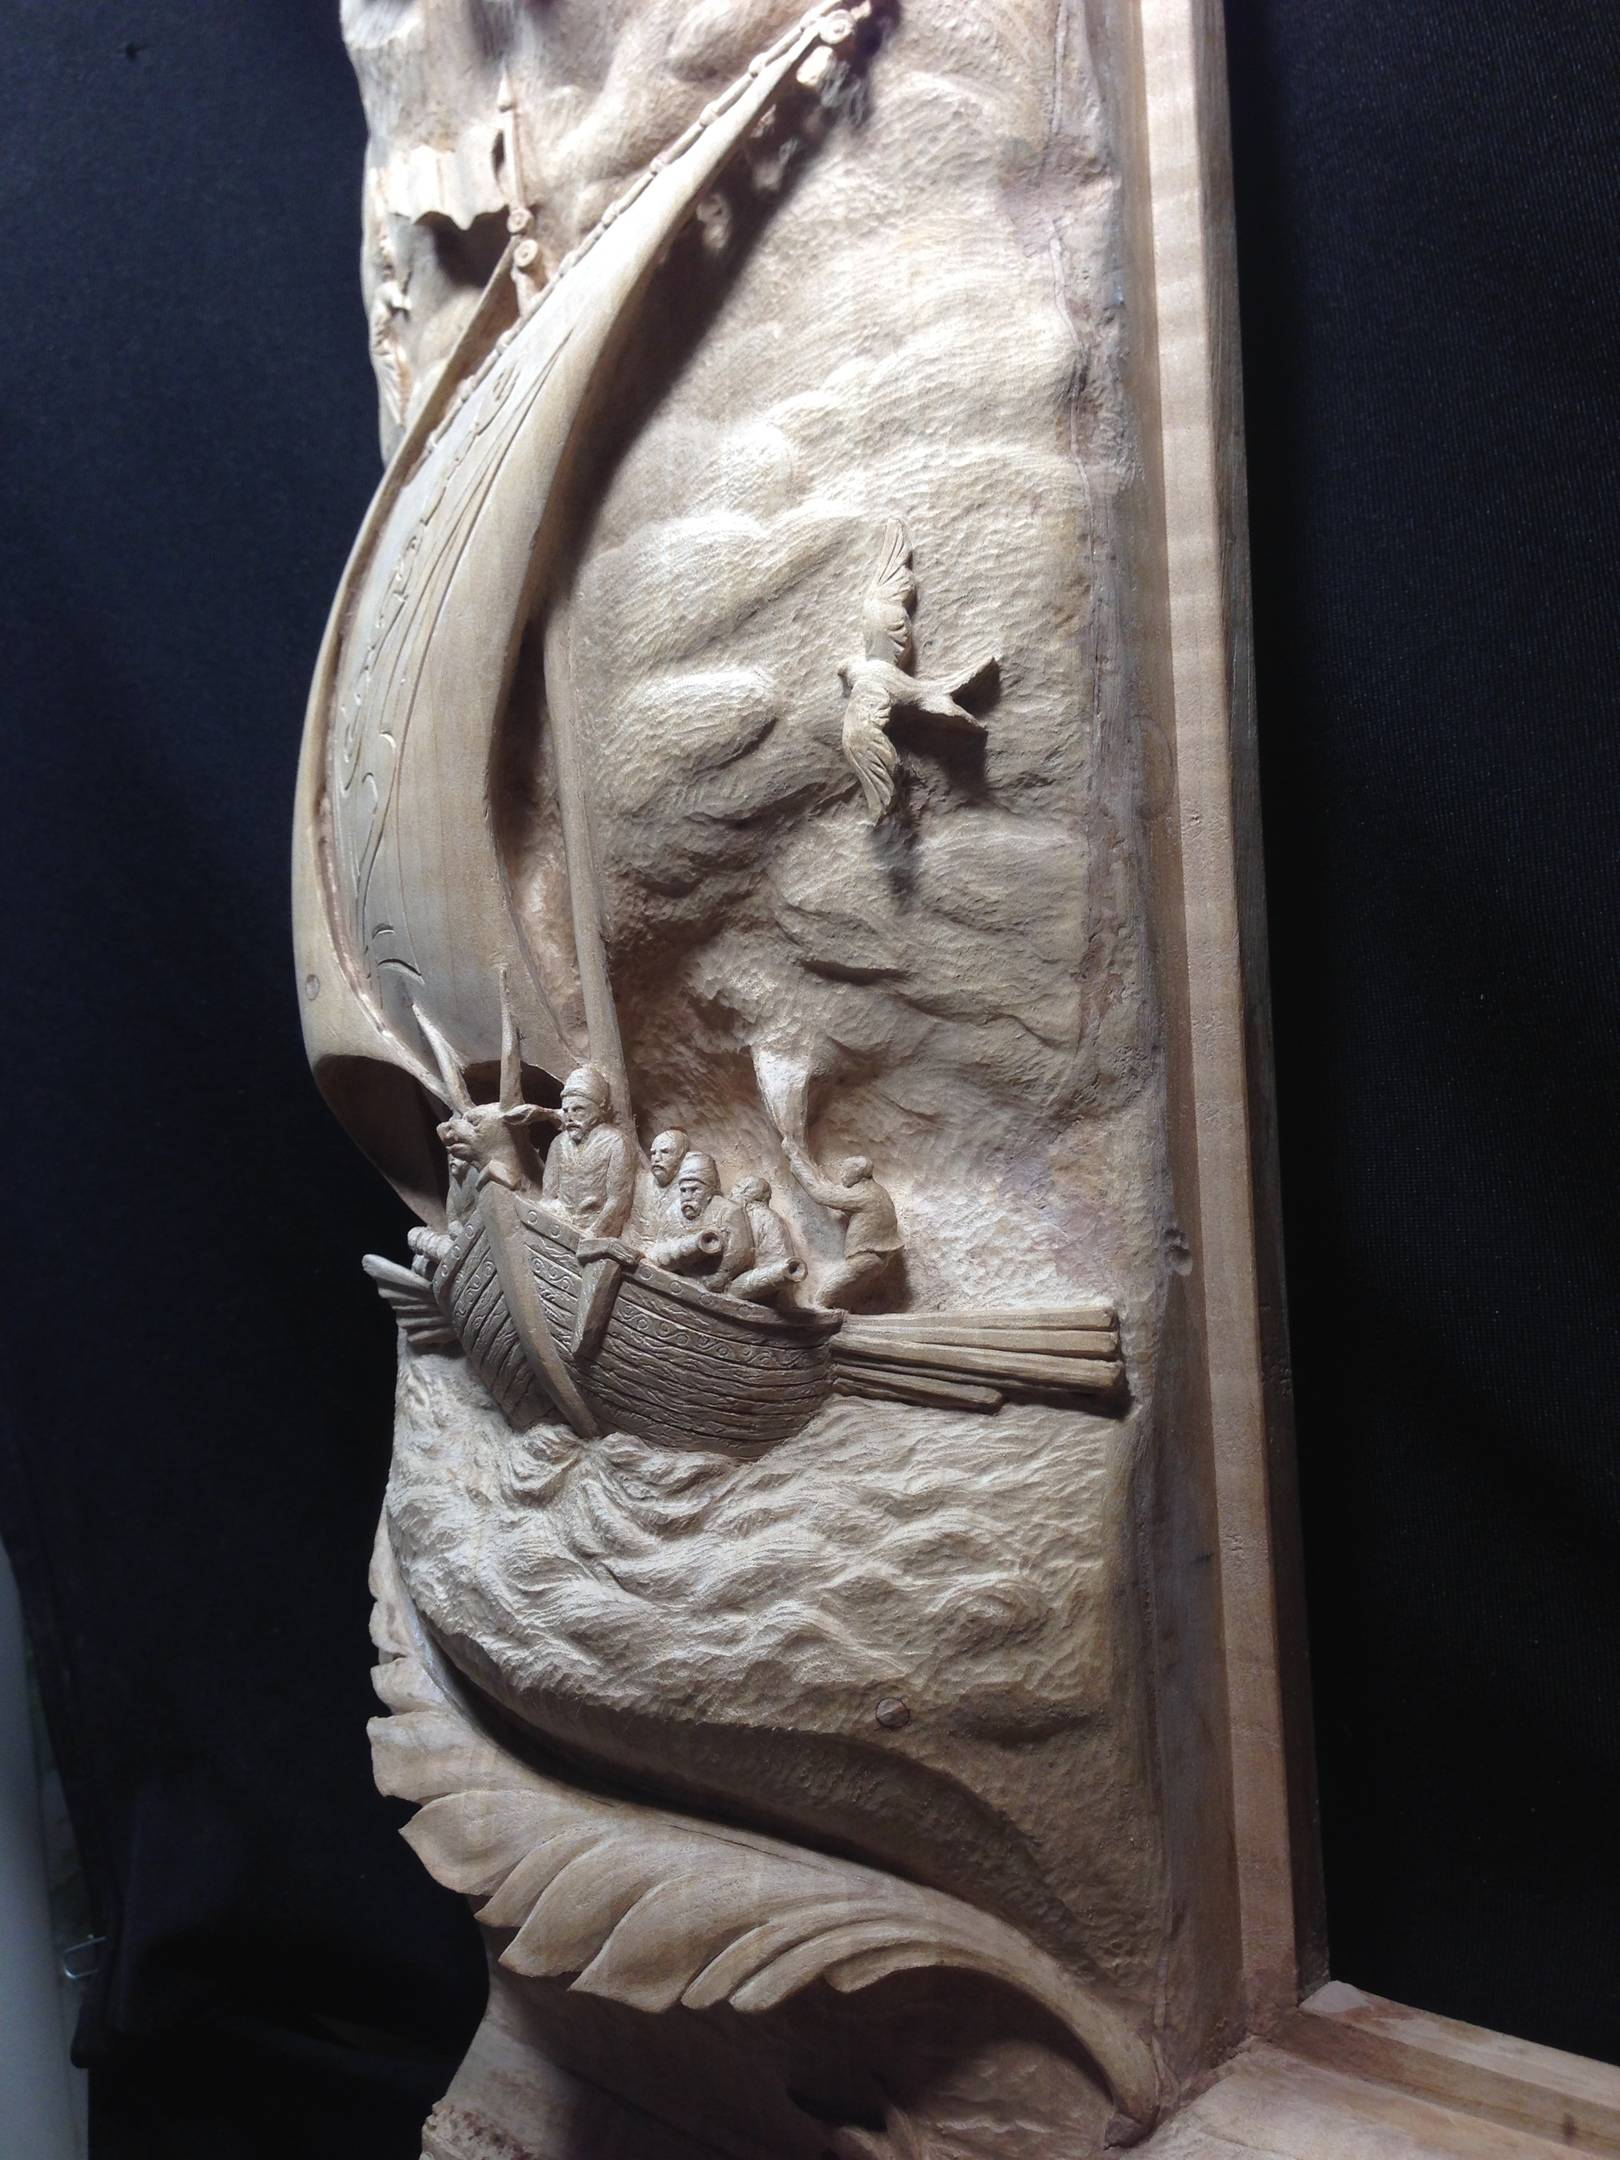 """Cossack Sea Coast Guard."" Material: pear. 2019 year. « Козацкий морской дозор». Материал: груша. 2019 год."